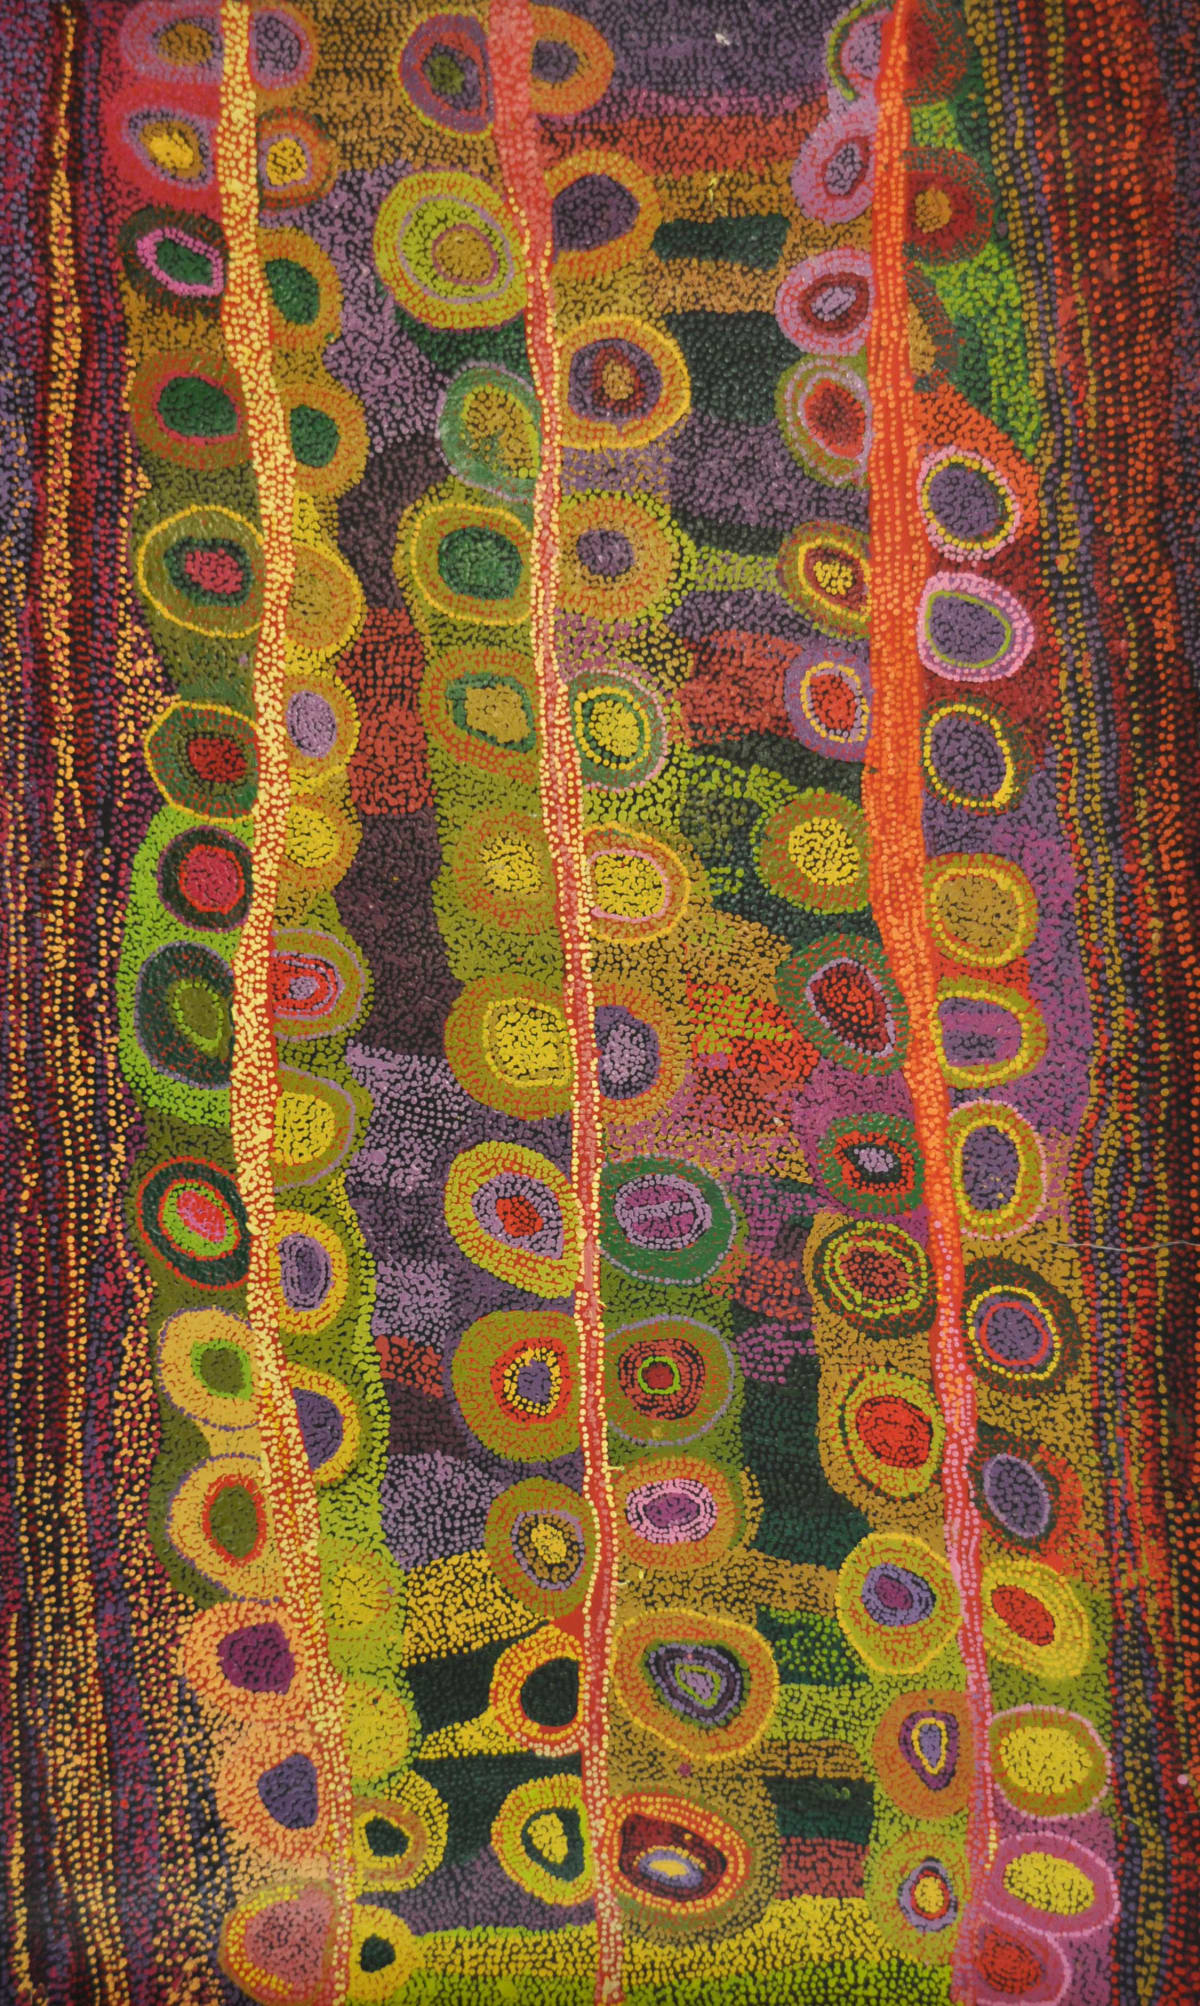 Wawiriya Burton Ngayuku ngura - My Country acrylic on linen 198 x 122 cm